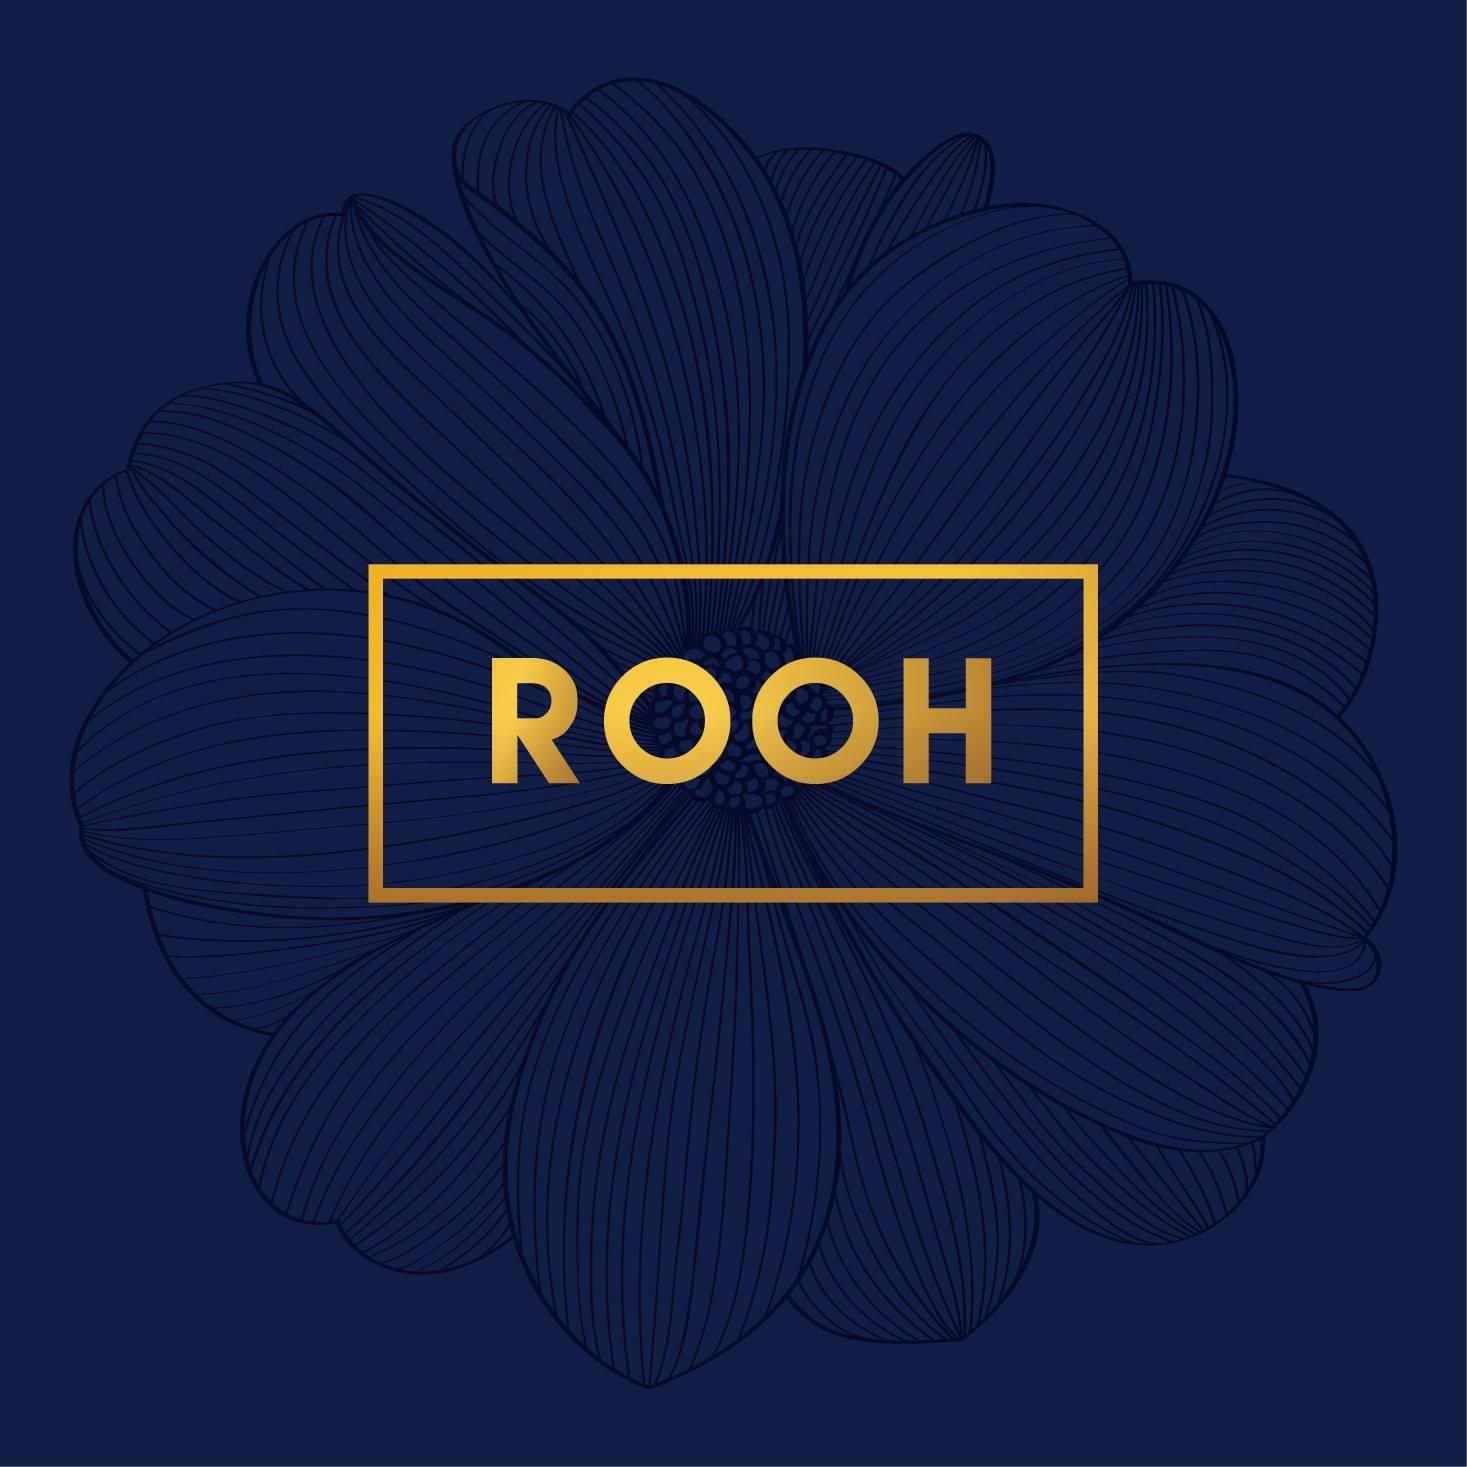 ROOH Chicago